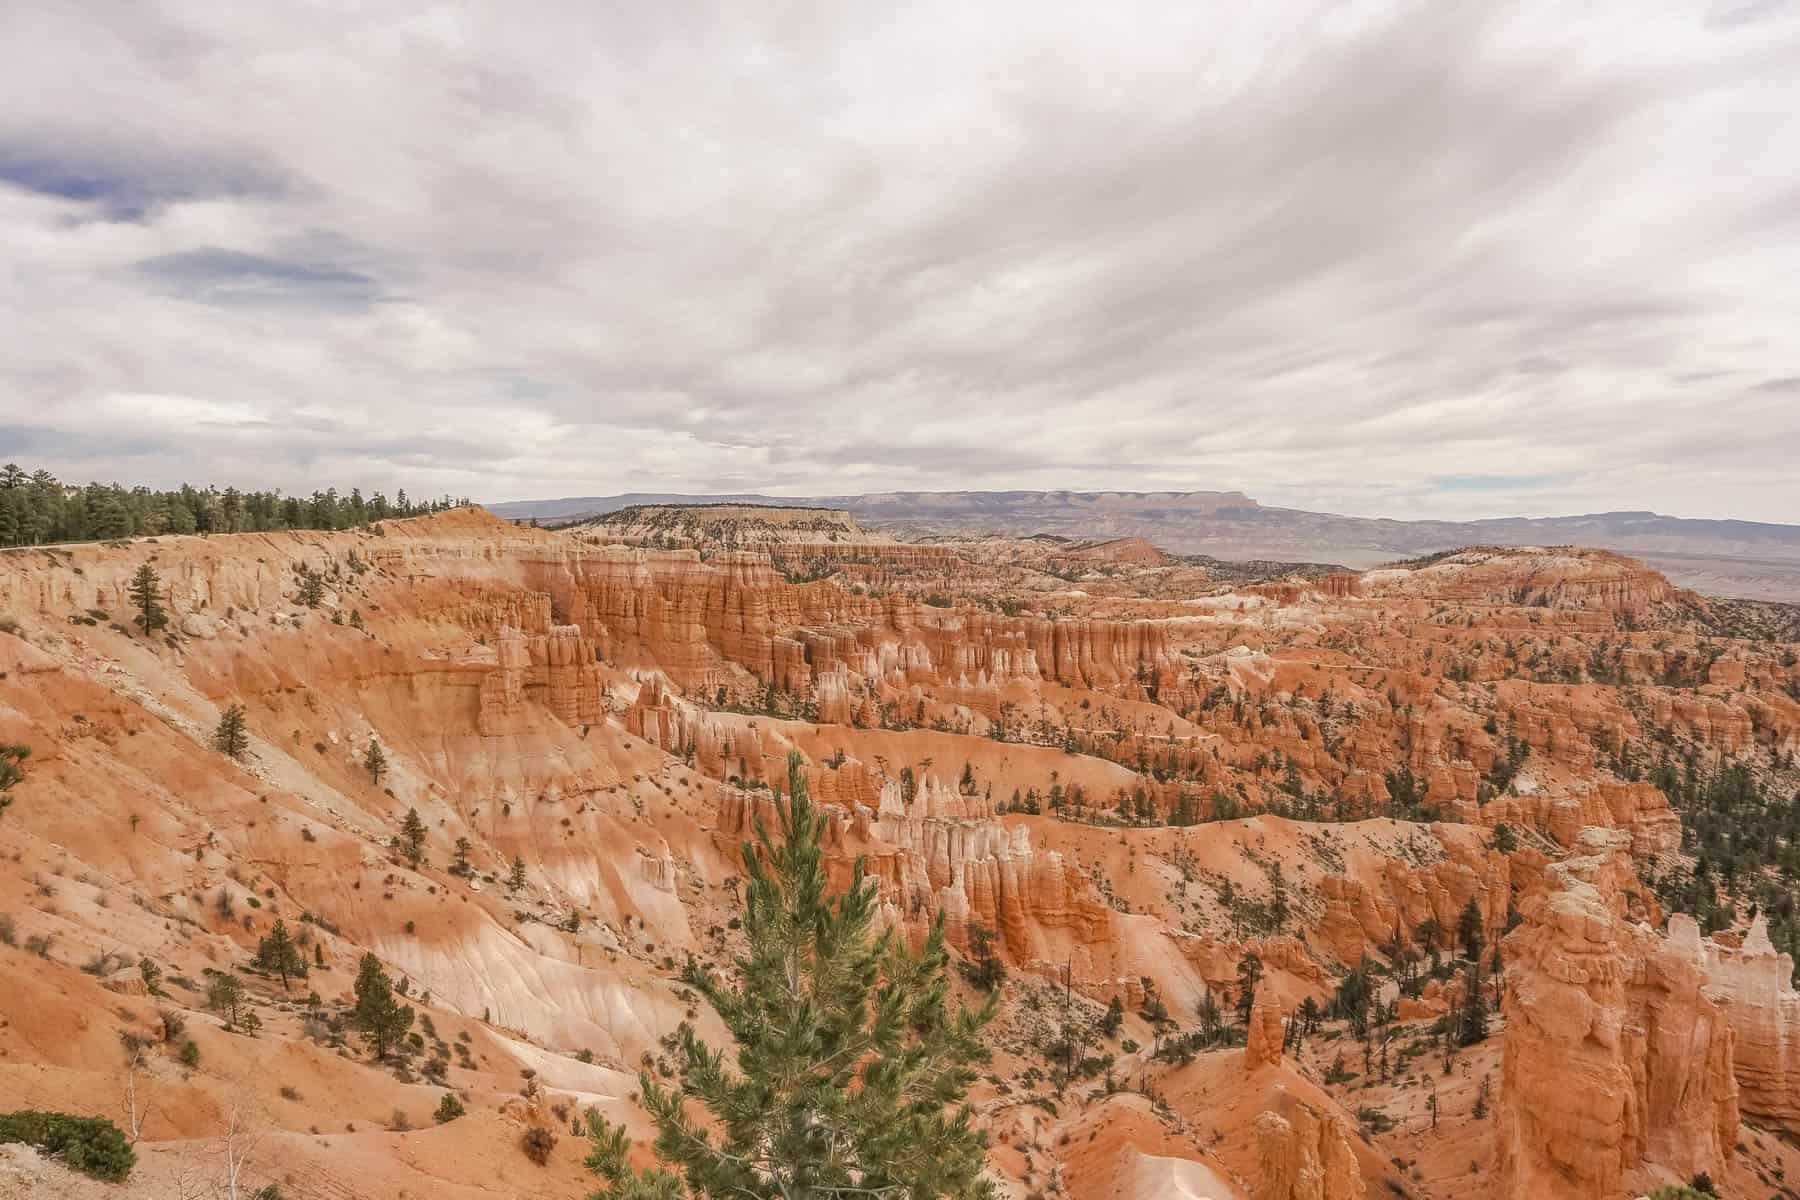 Utah Road Trip National Parks Itinerary